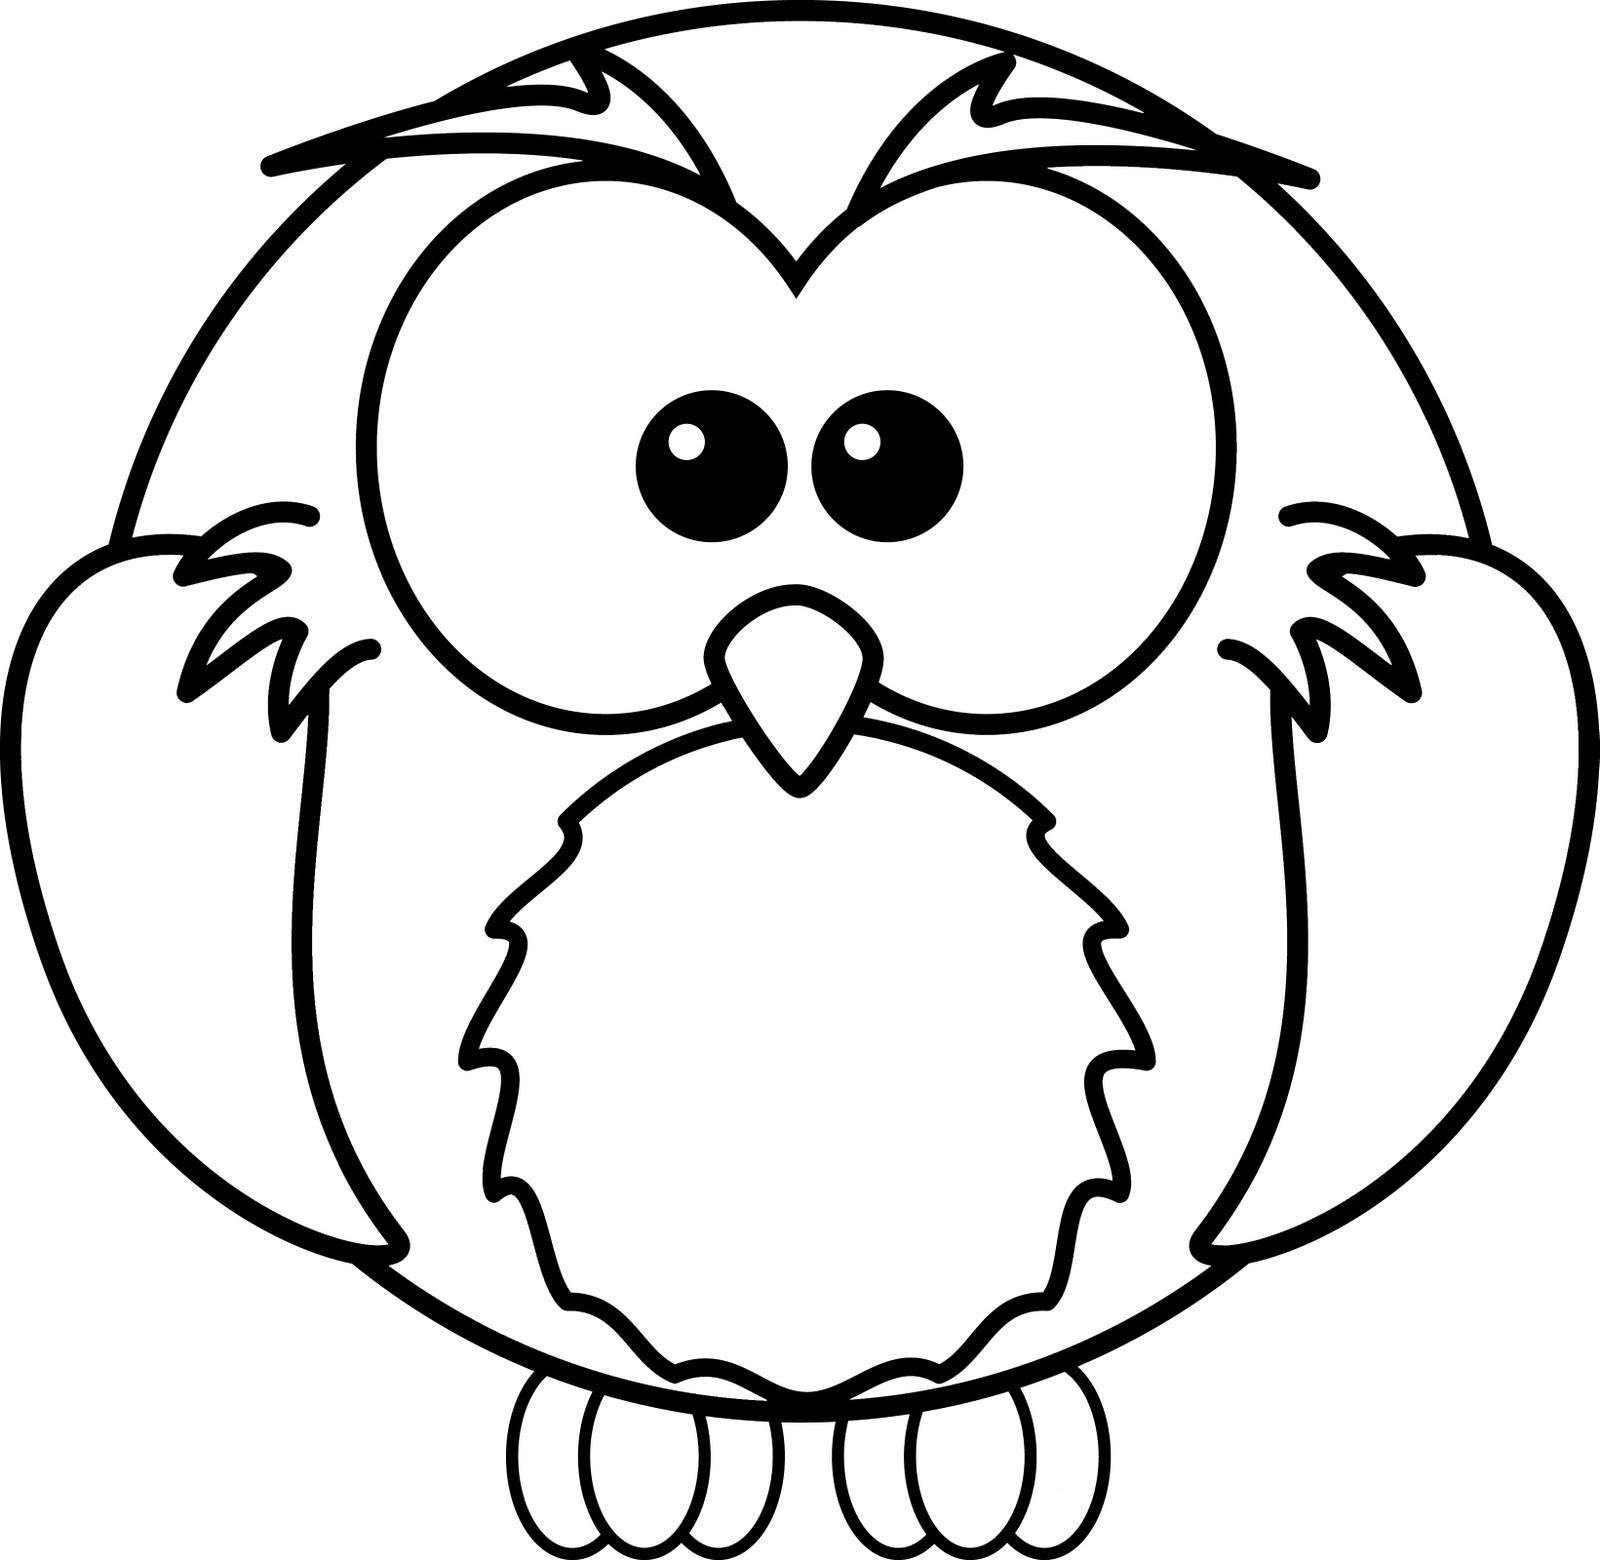 owl coloring page owl coloring pages owl coloring pages page coloring owl